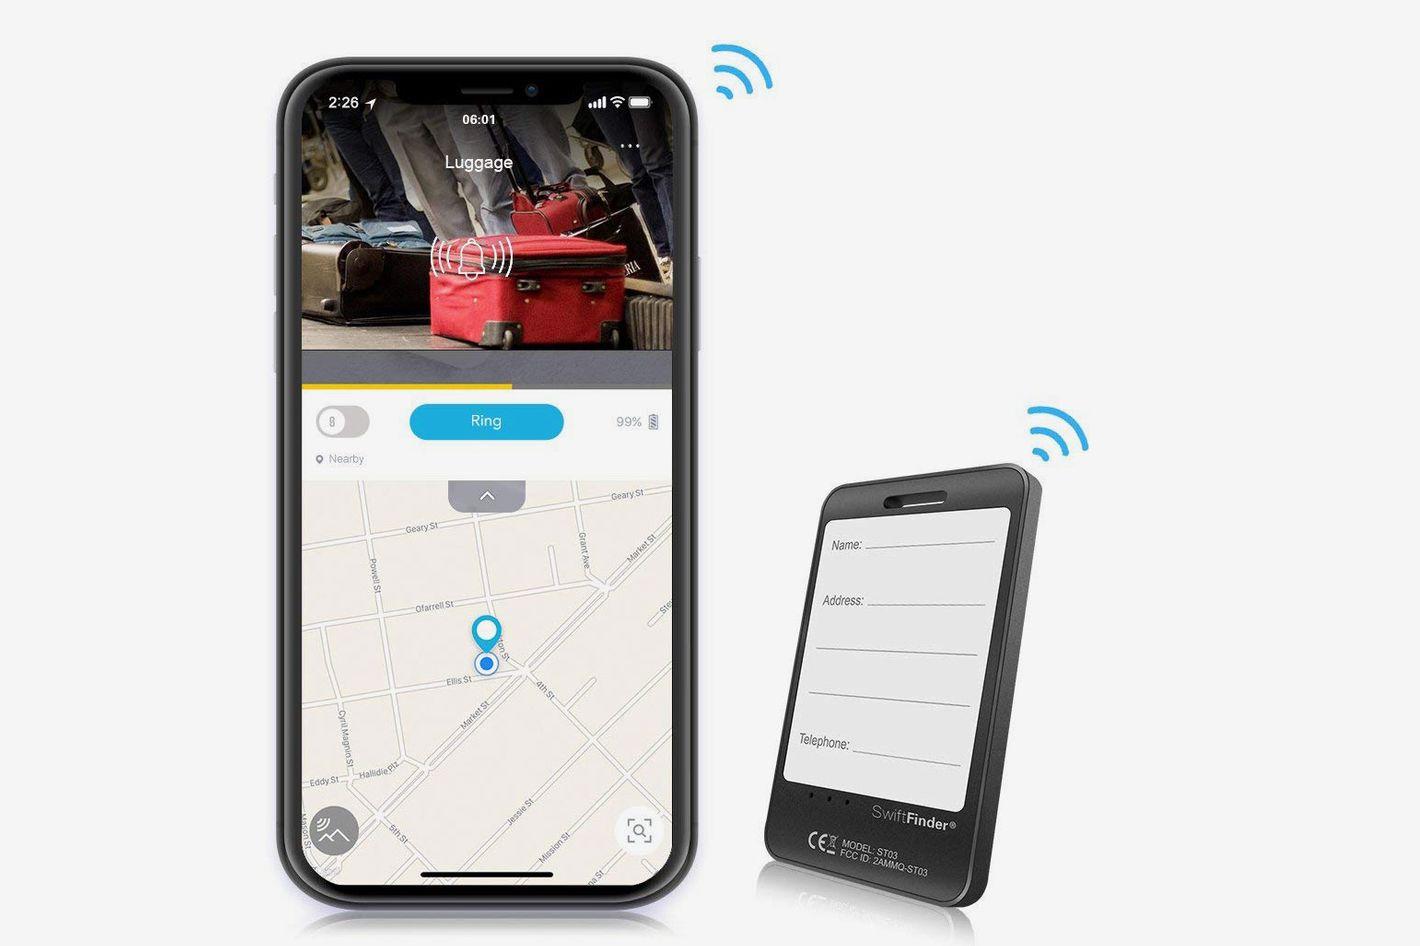 Bluetooth Luggage Tracker